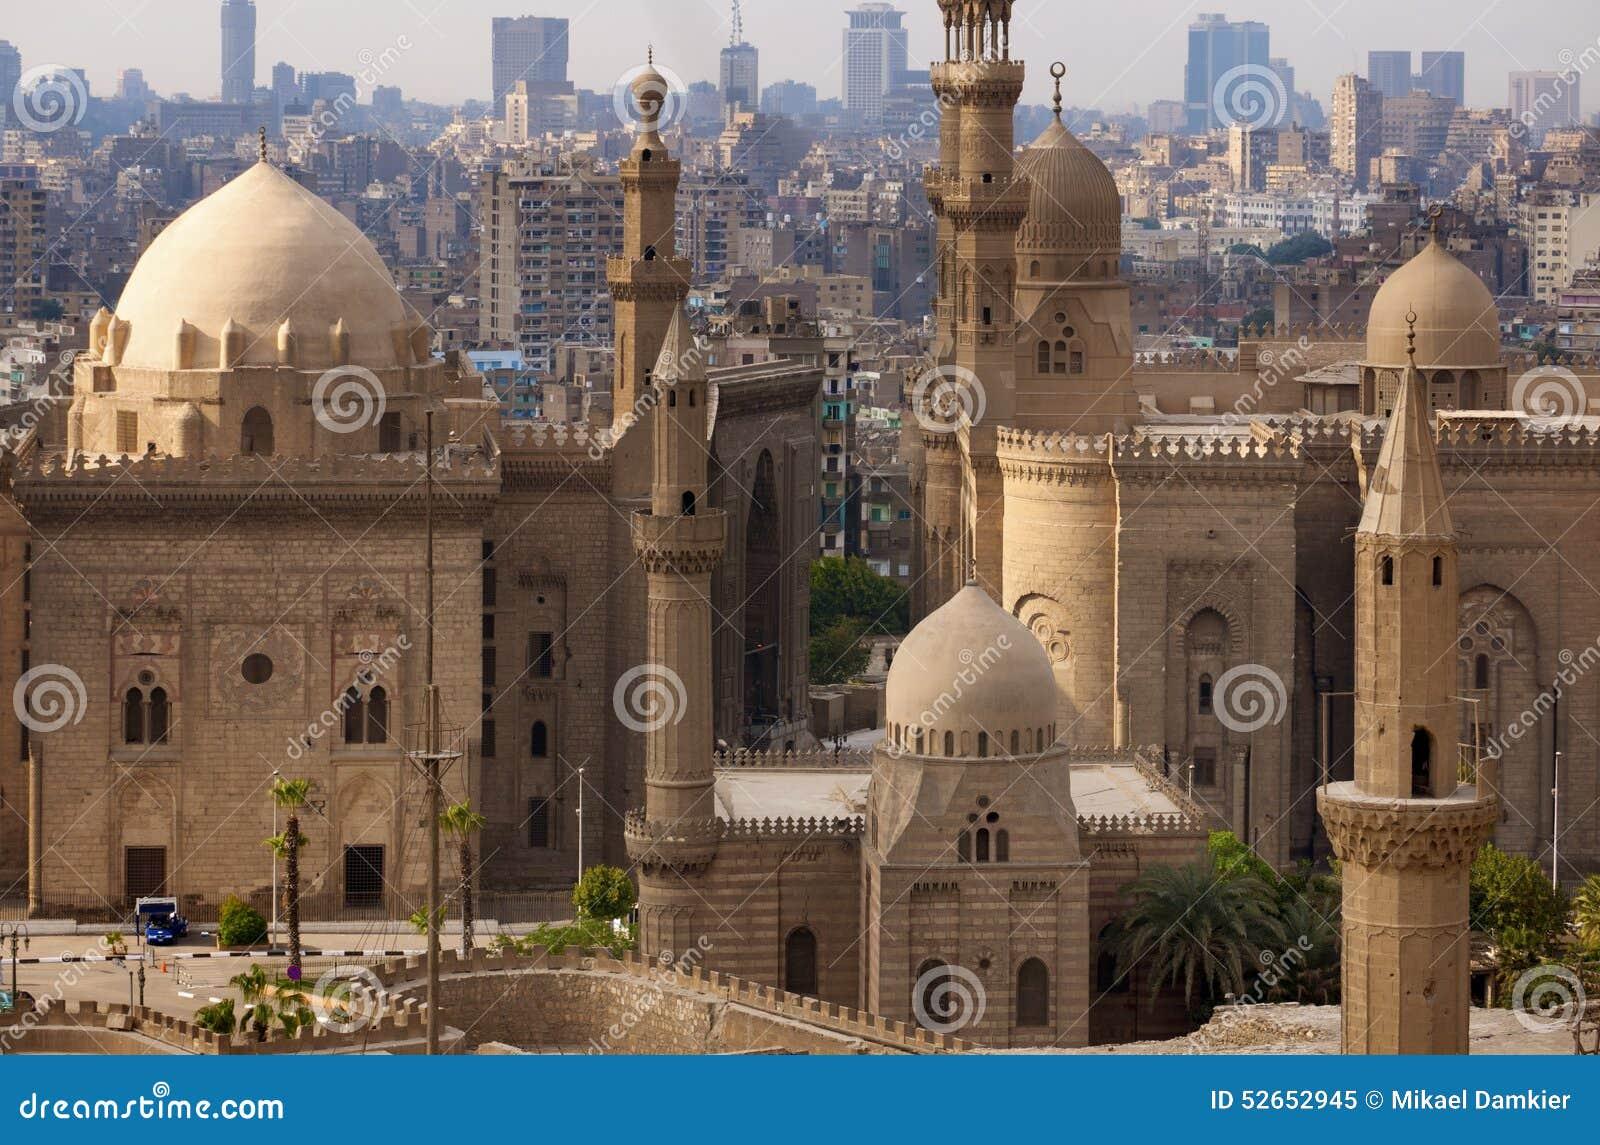 Cairo skyline, Egypt